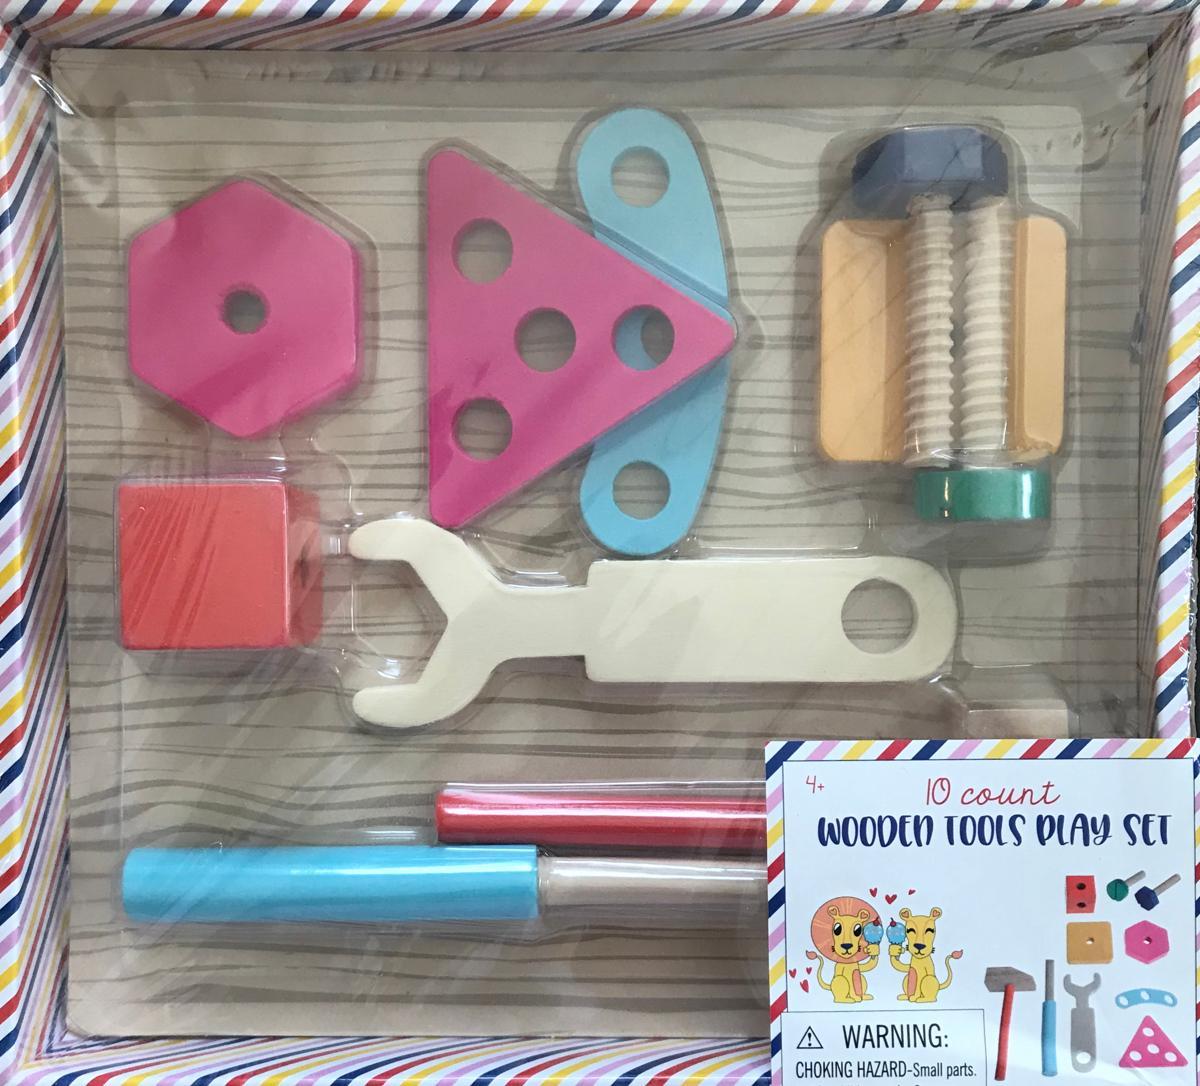 Wooden 10 PieceTools Play Set